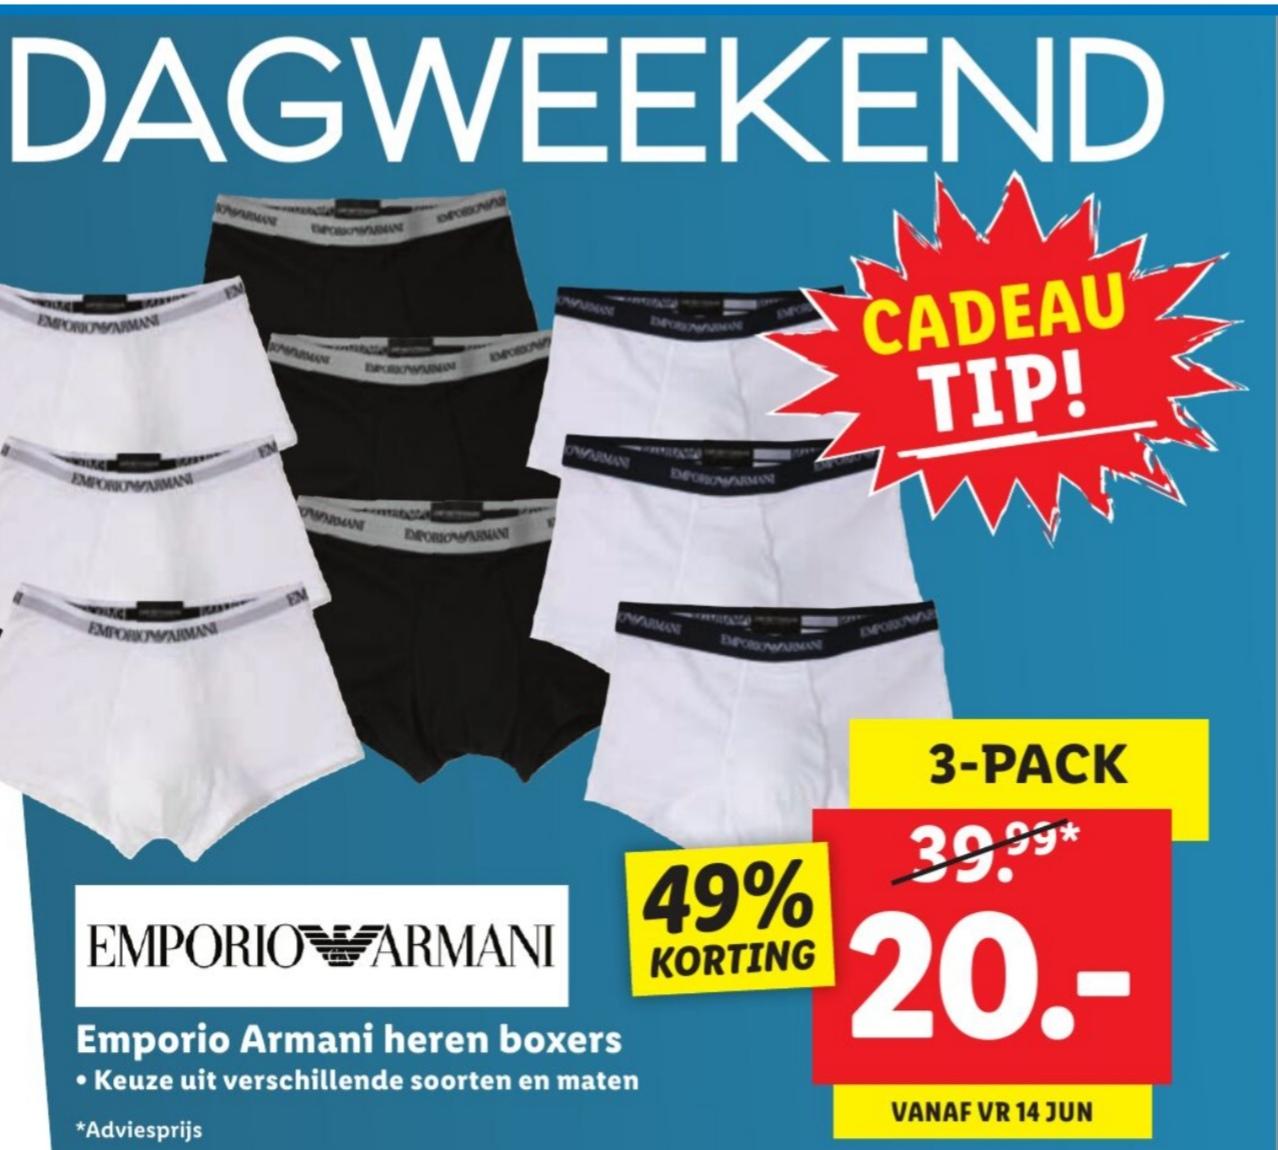 Emporio Armani boxers 3pack 20 euro @ Lidl